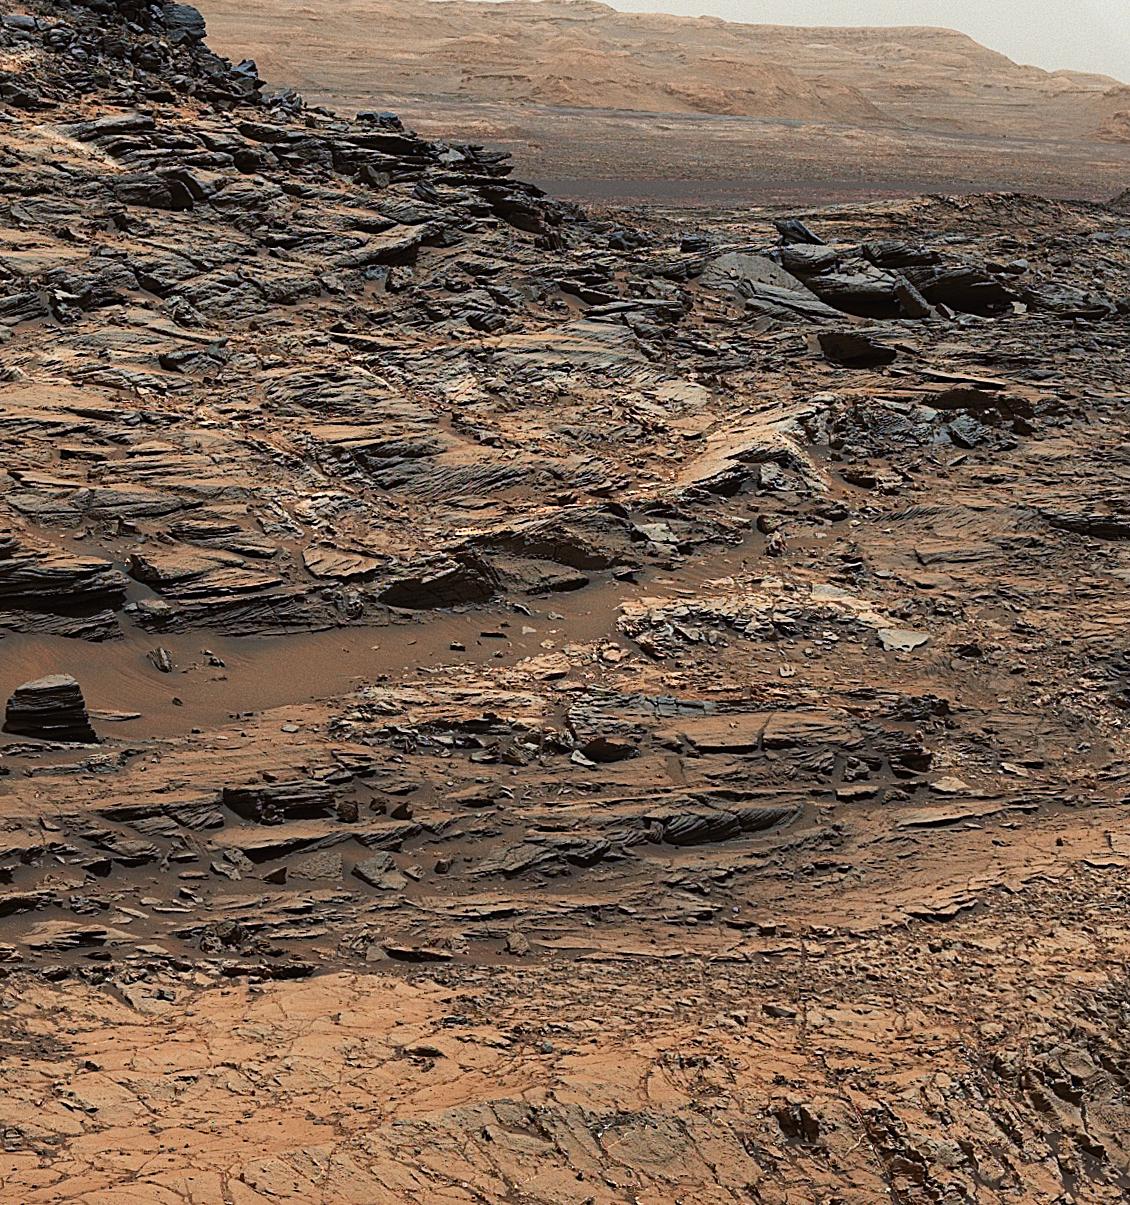 Images Multimedia Nasa S Mars Exploration Program Curiosity Rover Curiosity Mars Mars Pictures